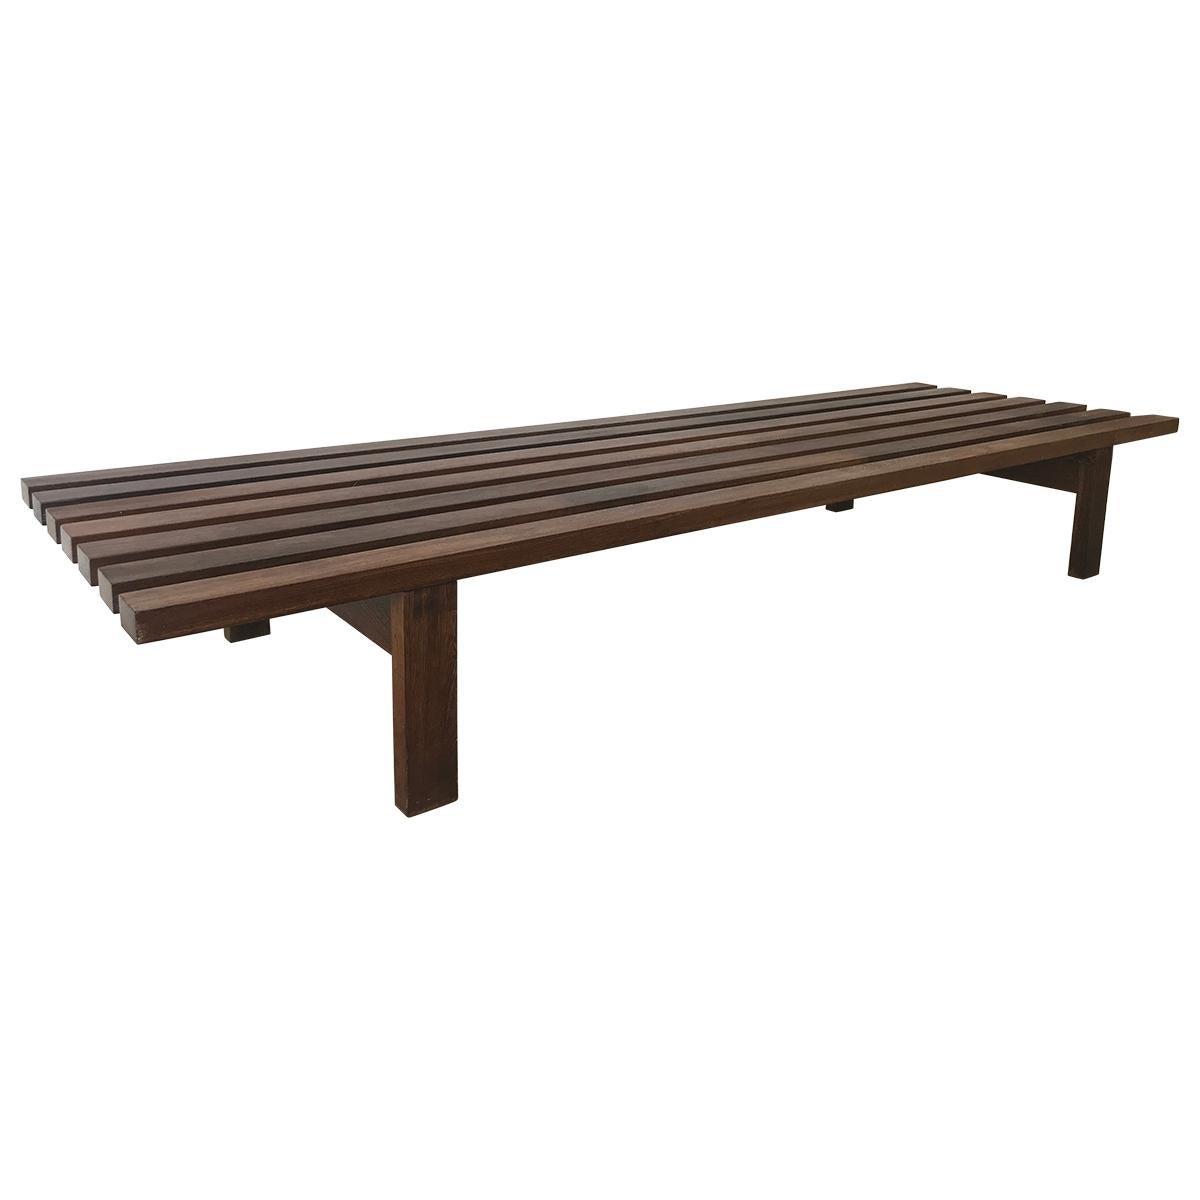 BZ Slated Bench